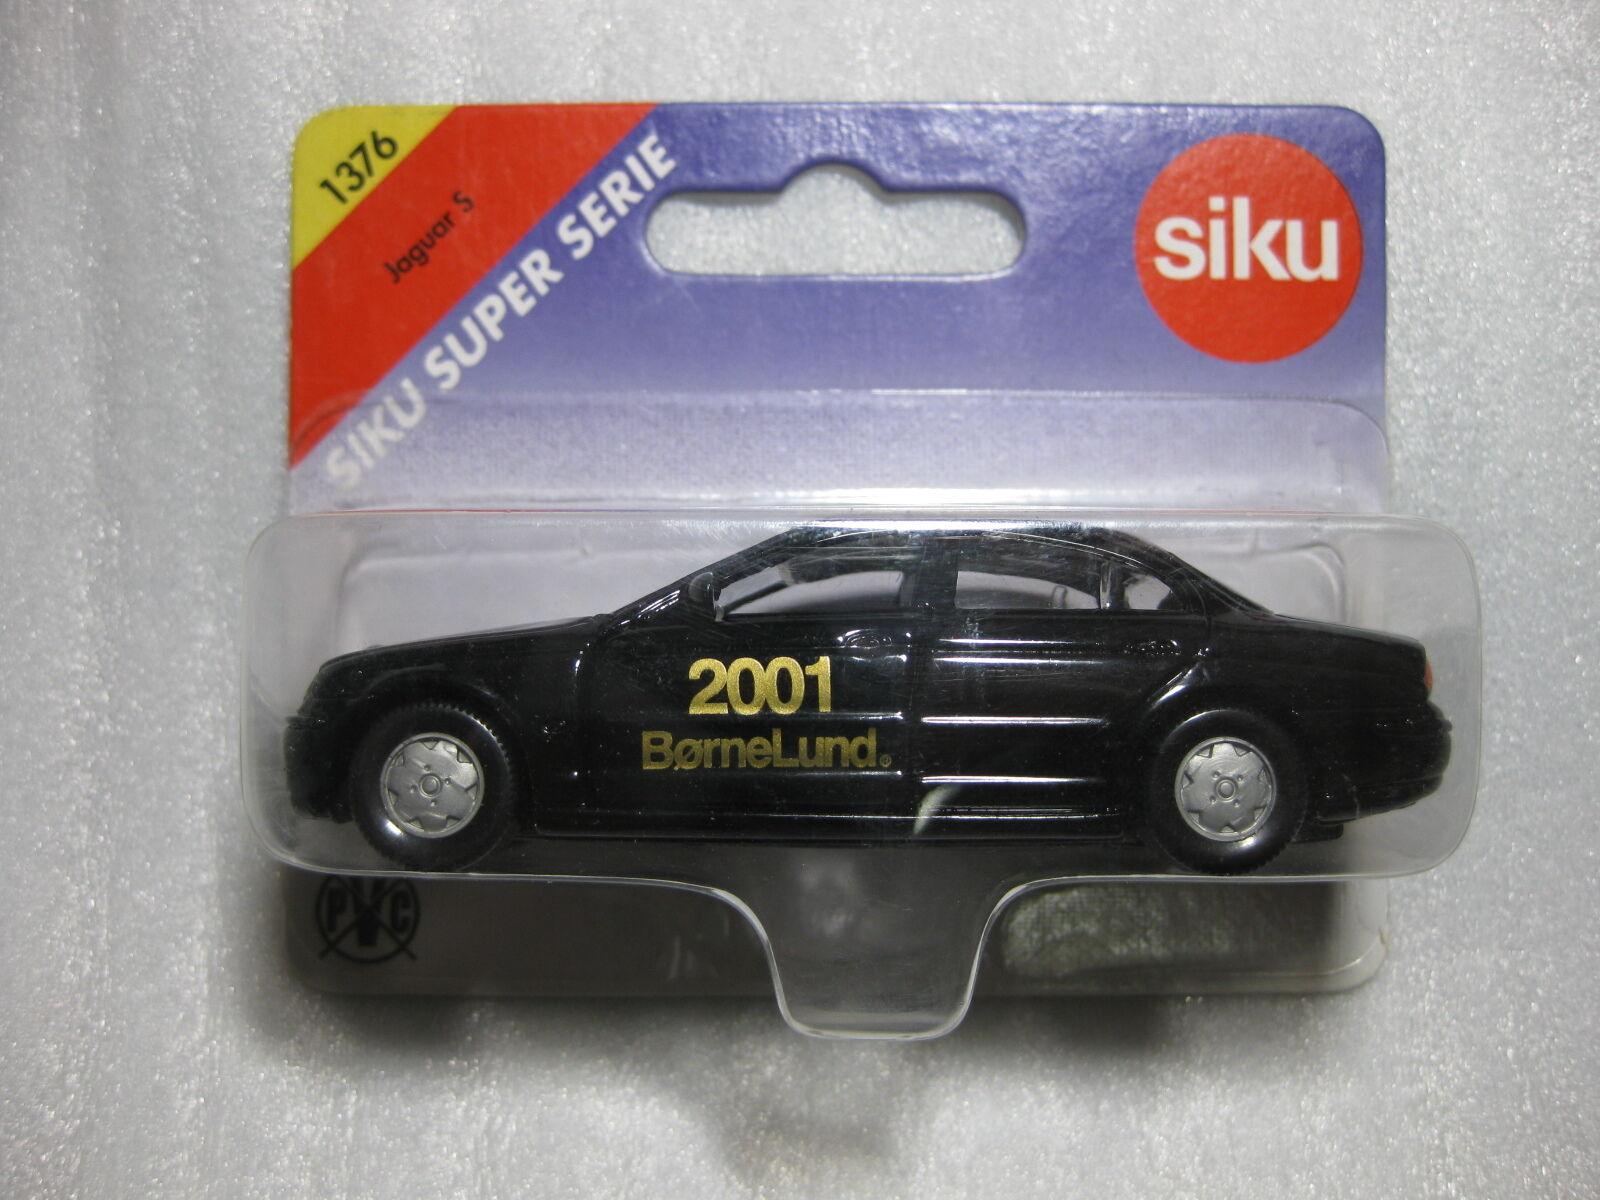 SIKU JAGUAR S 4.0V8 bornelund 2001 Exclusive Diecast model rare promo